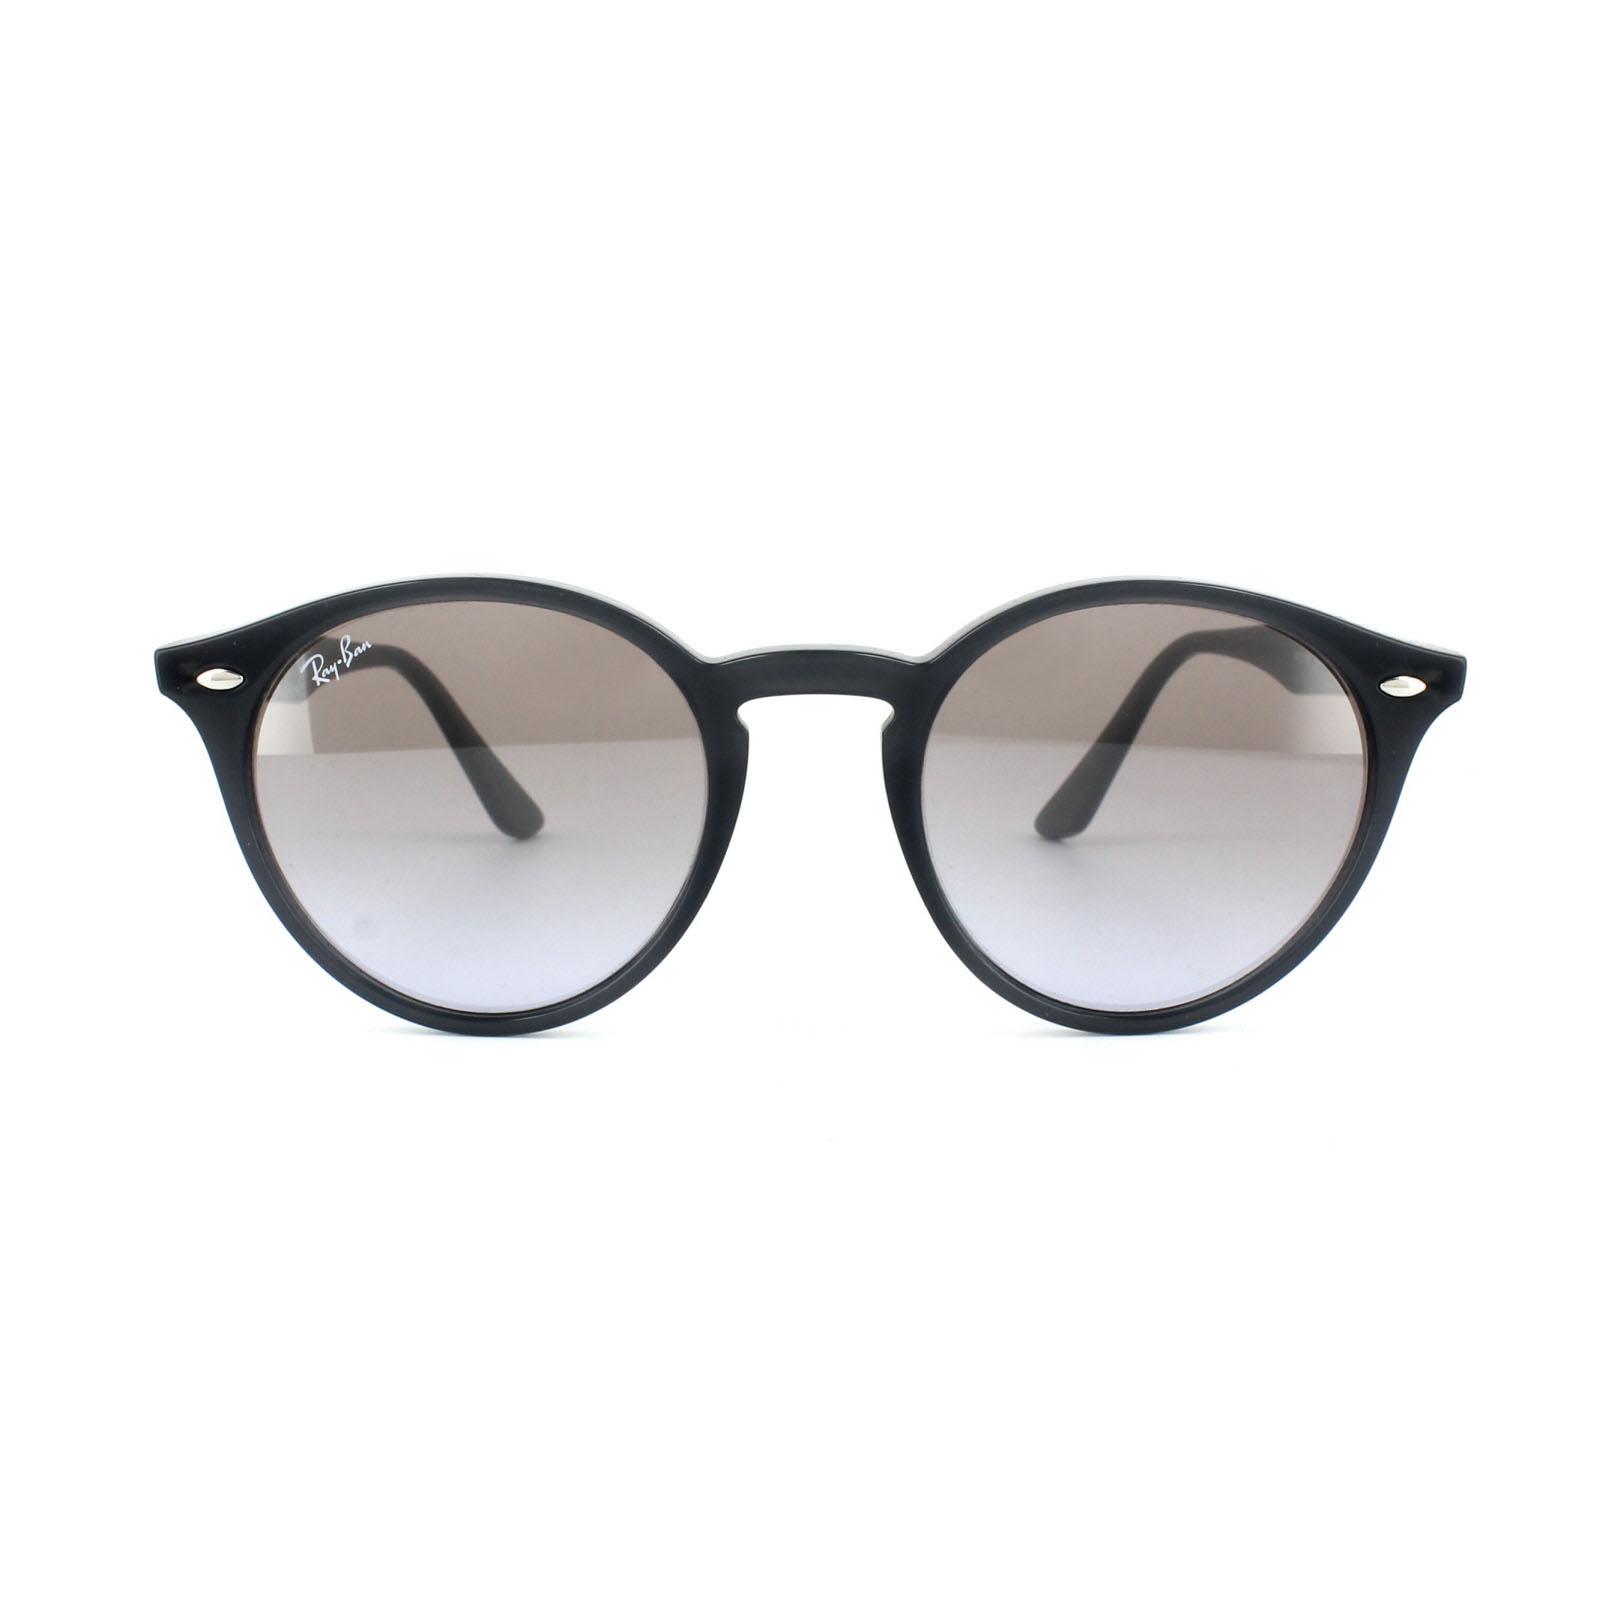 7c86d76efc Sentinel Ray-Ban Sunglasses 2180 623094 Grey Brown Violet Gradient Mirror